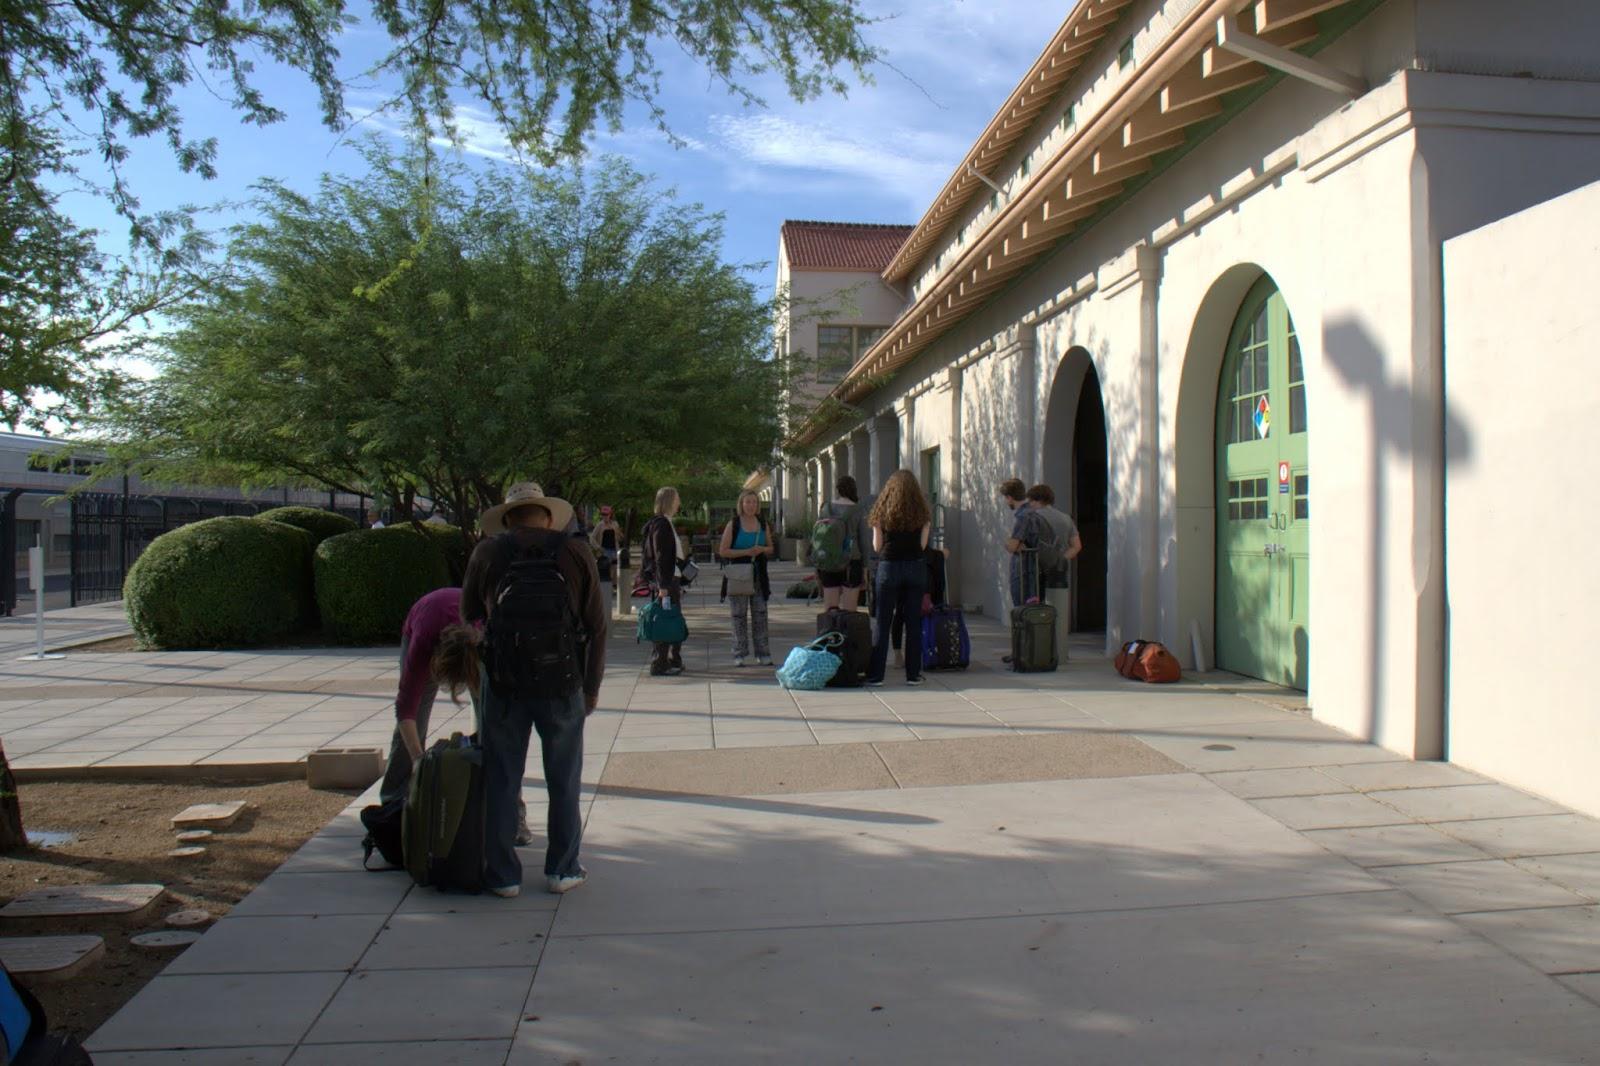 Arriving at the Tucson Amtrak Station